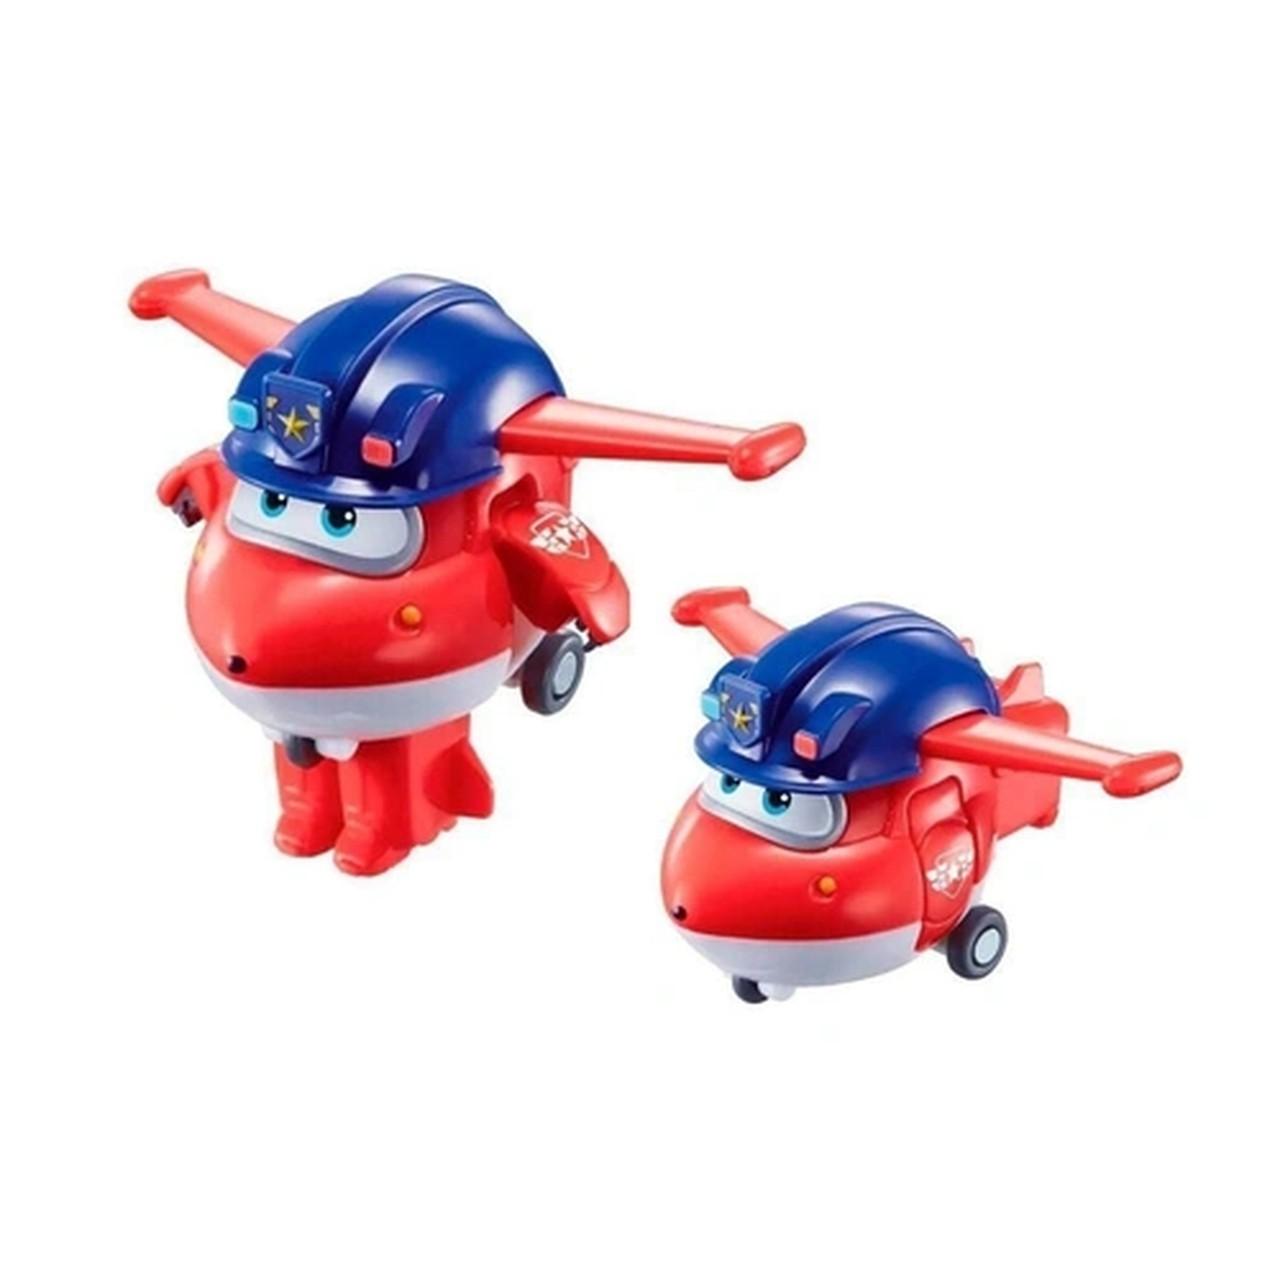 Super Wings Jett Policial - Boneco Transformável 13cm - Fun